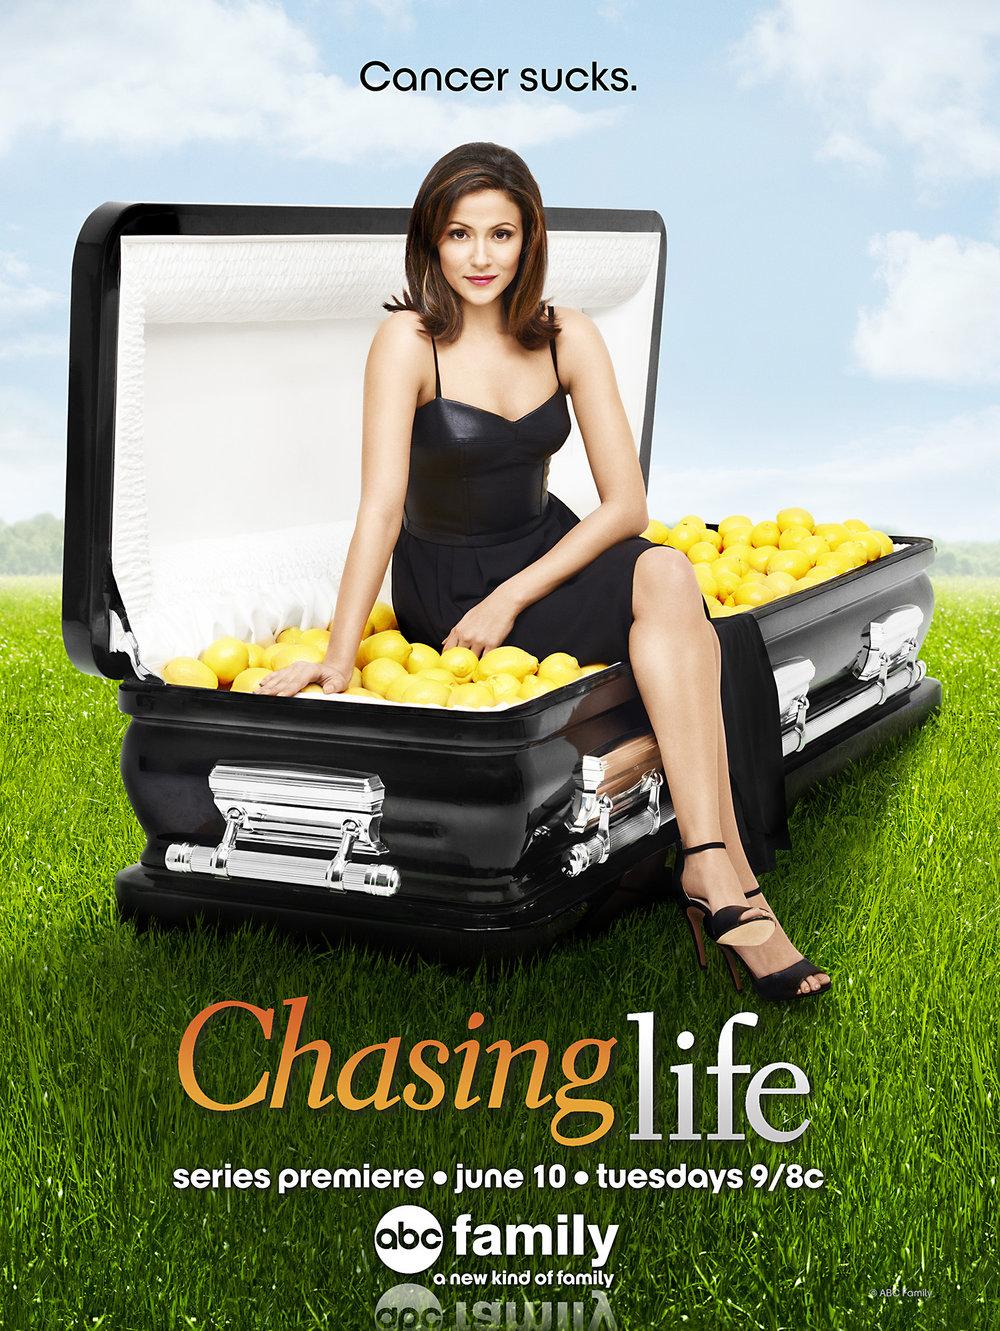 chasinglife.jpg